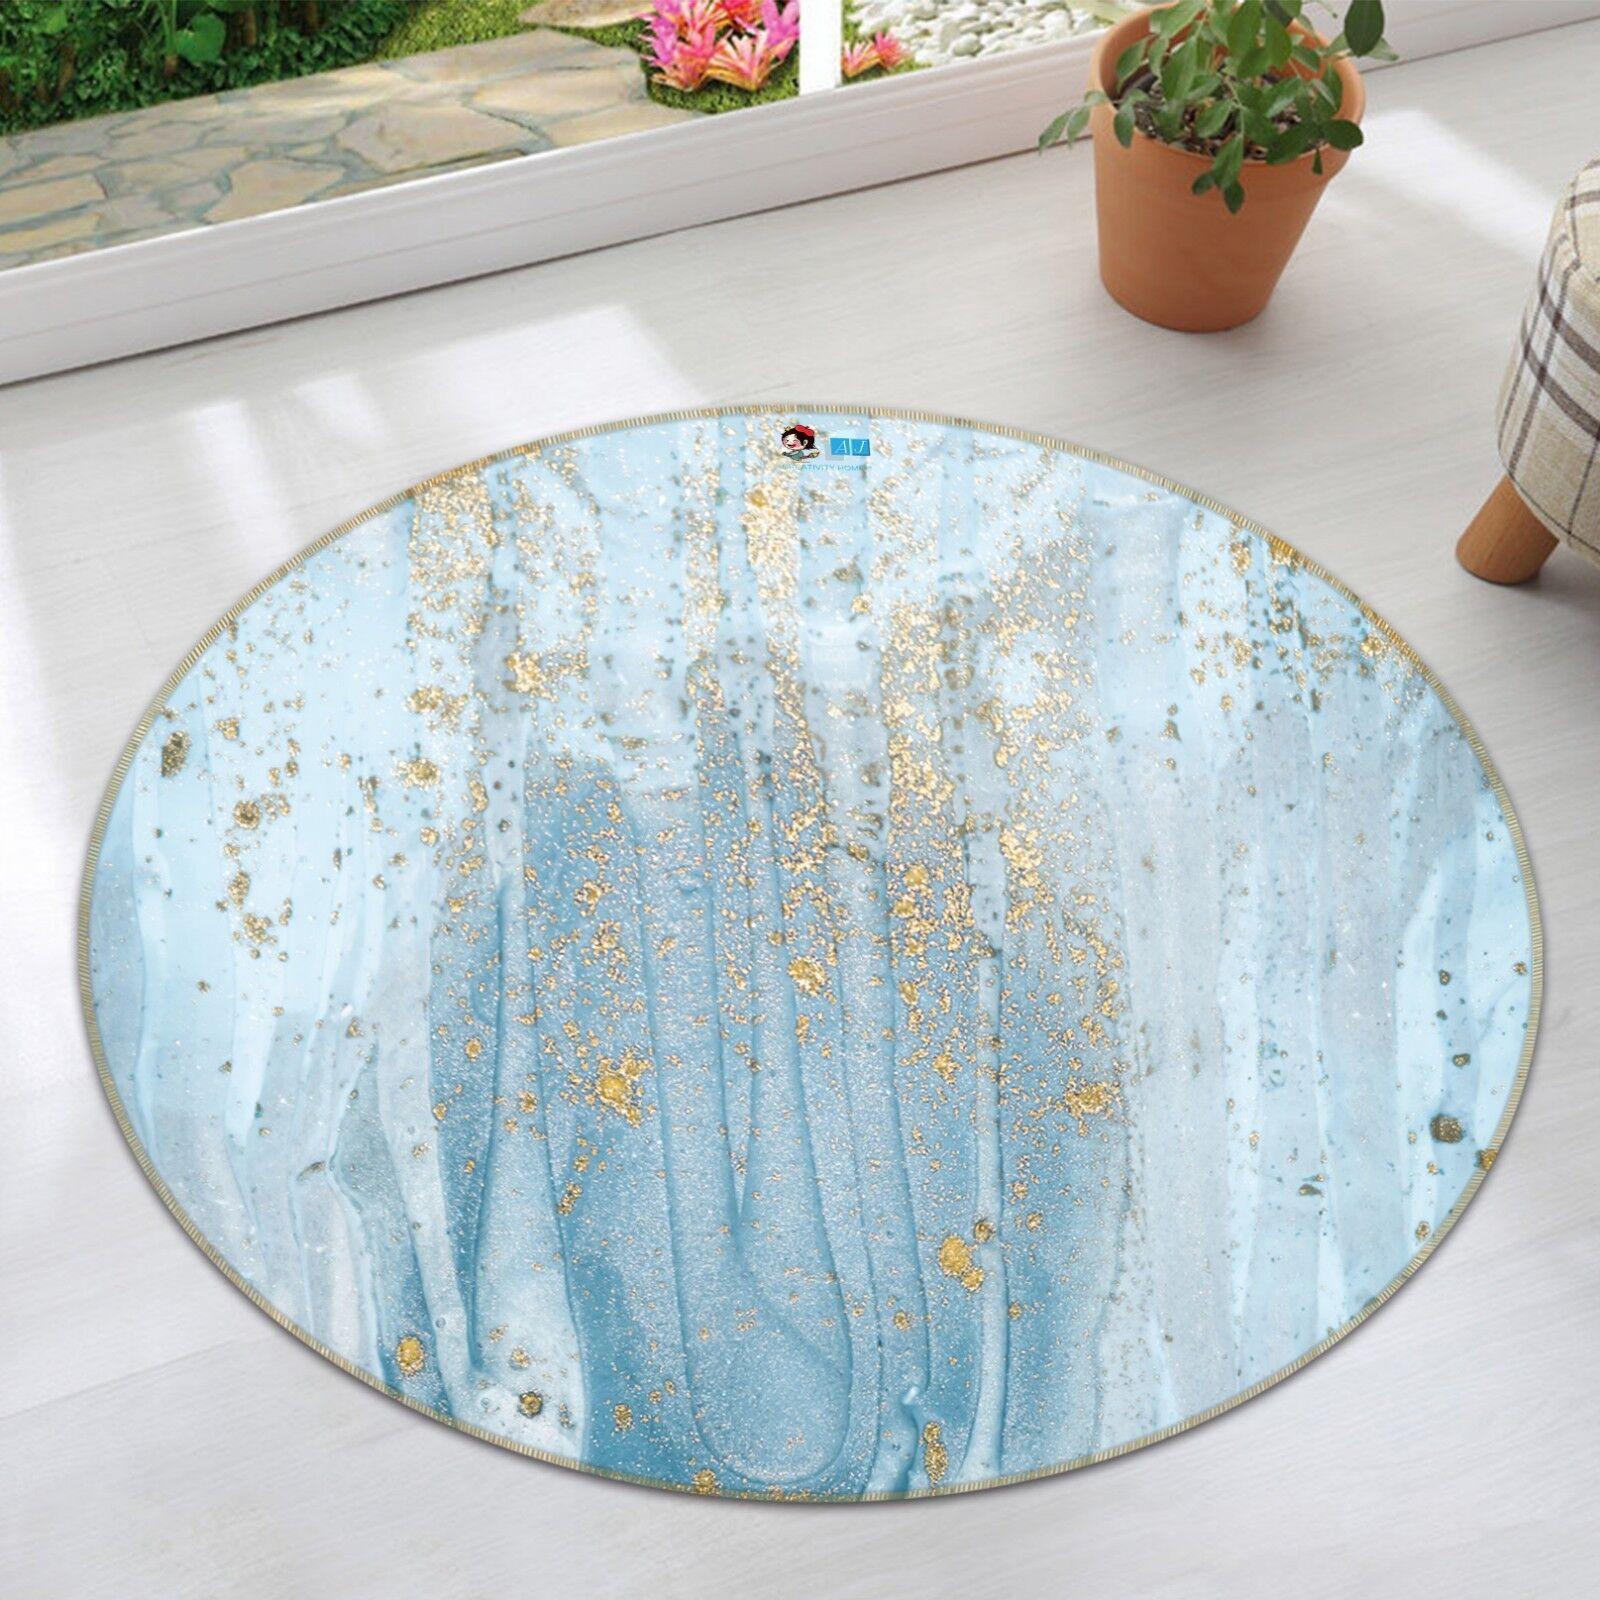 3D Golden Golden Golden Blau Ink 9 Non Slip Rug Room Mat Round Quality elegant photo carpet AU 2a9ff2